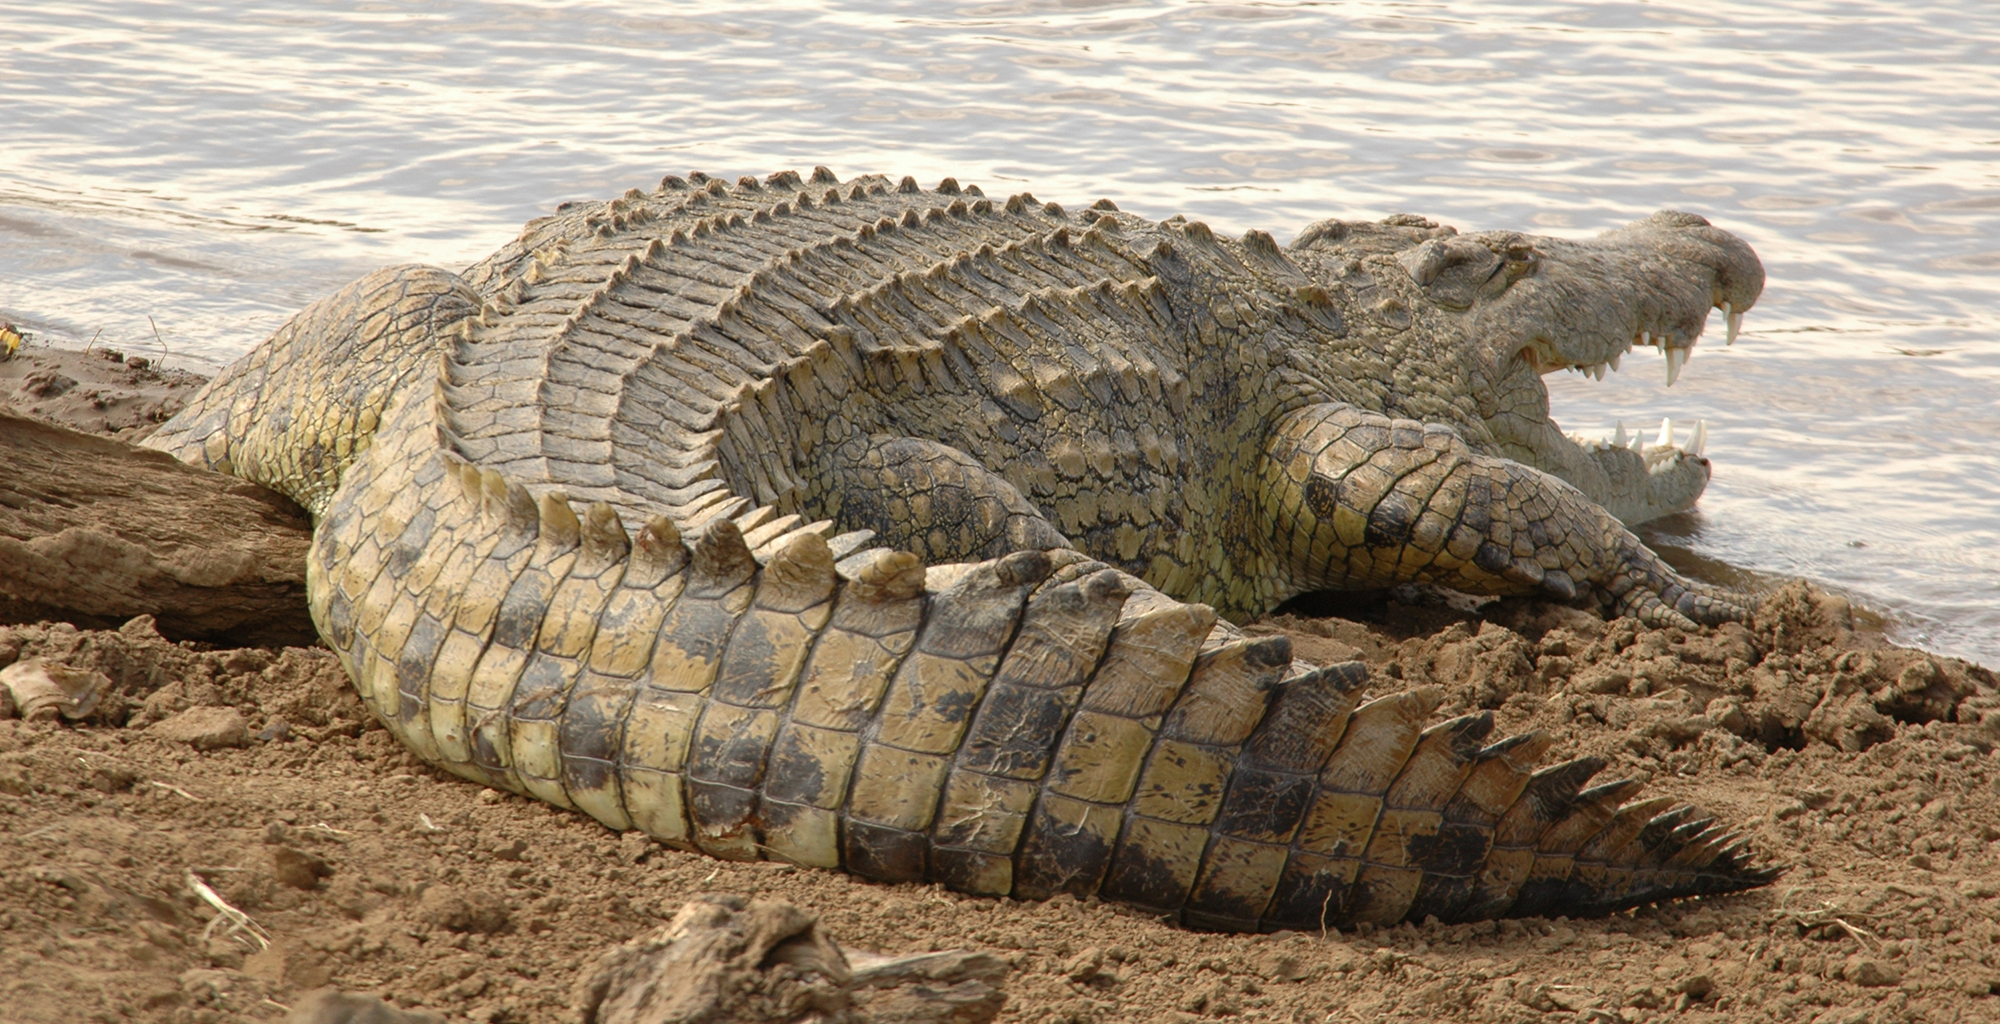 Kenya-Tana-Delta-Camp-Crocodile